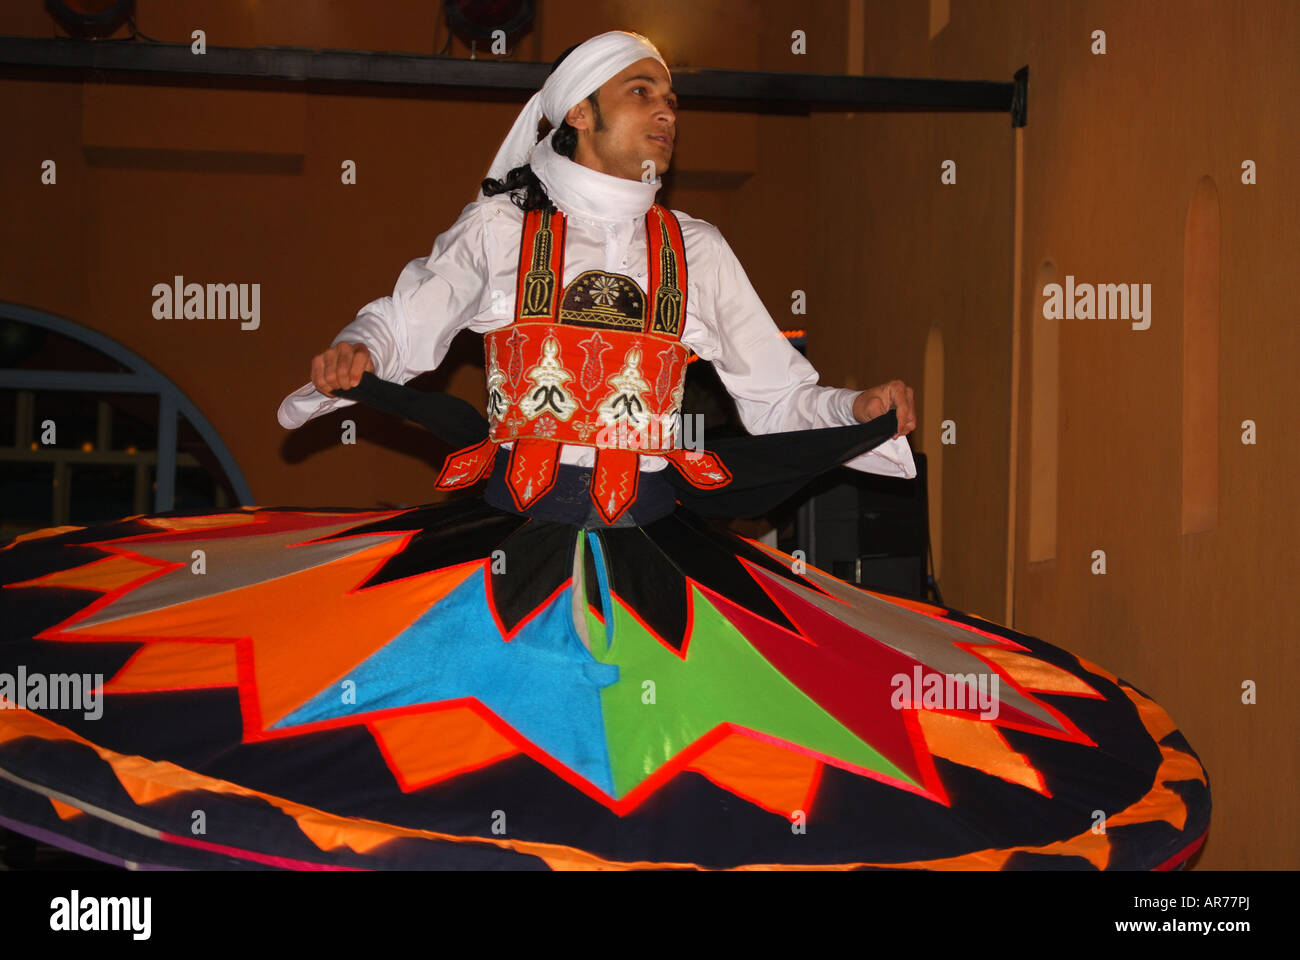 Egyptian dancer, InterContinental Taba Heights, Taba Heights, Sinai Peninsula, Republic of Egypt Stock Photo